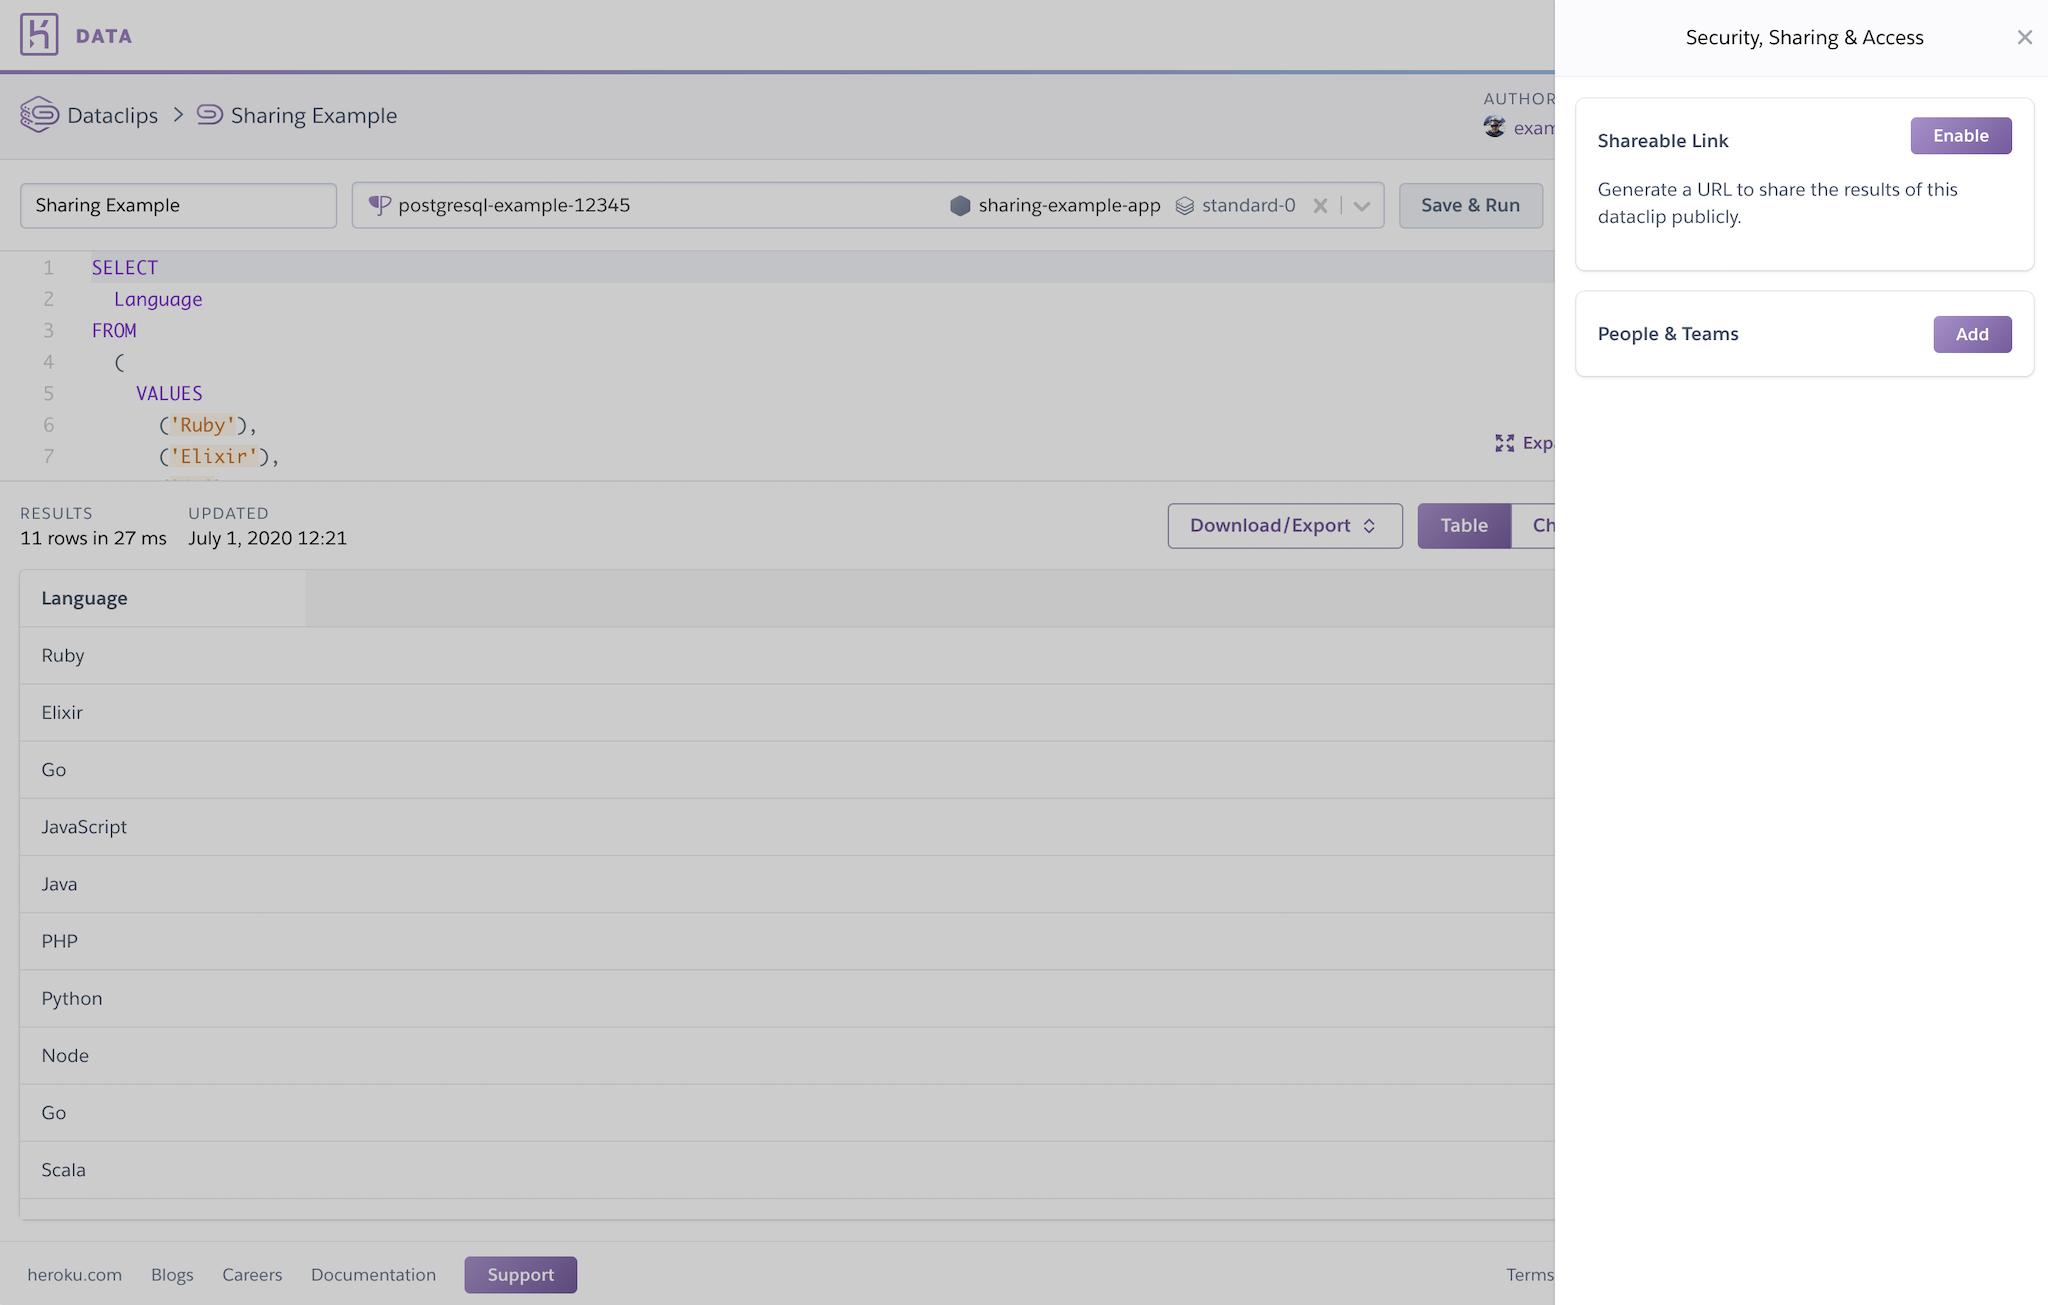 Screenshot of data.heroku.com with the Dataclip sharing flyout visible